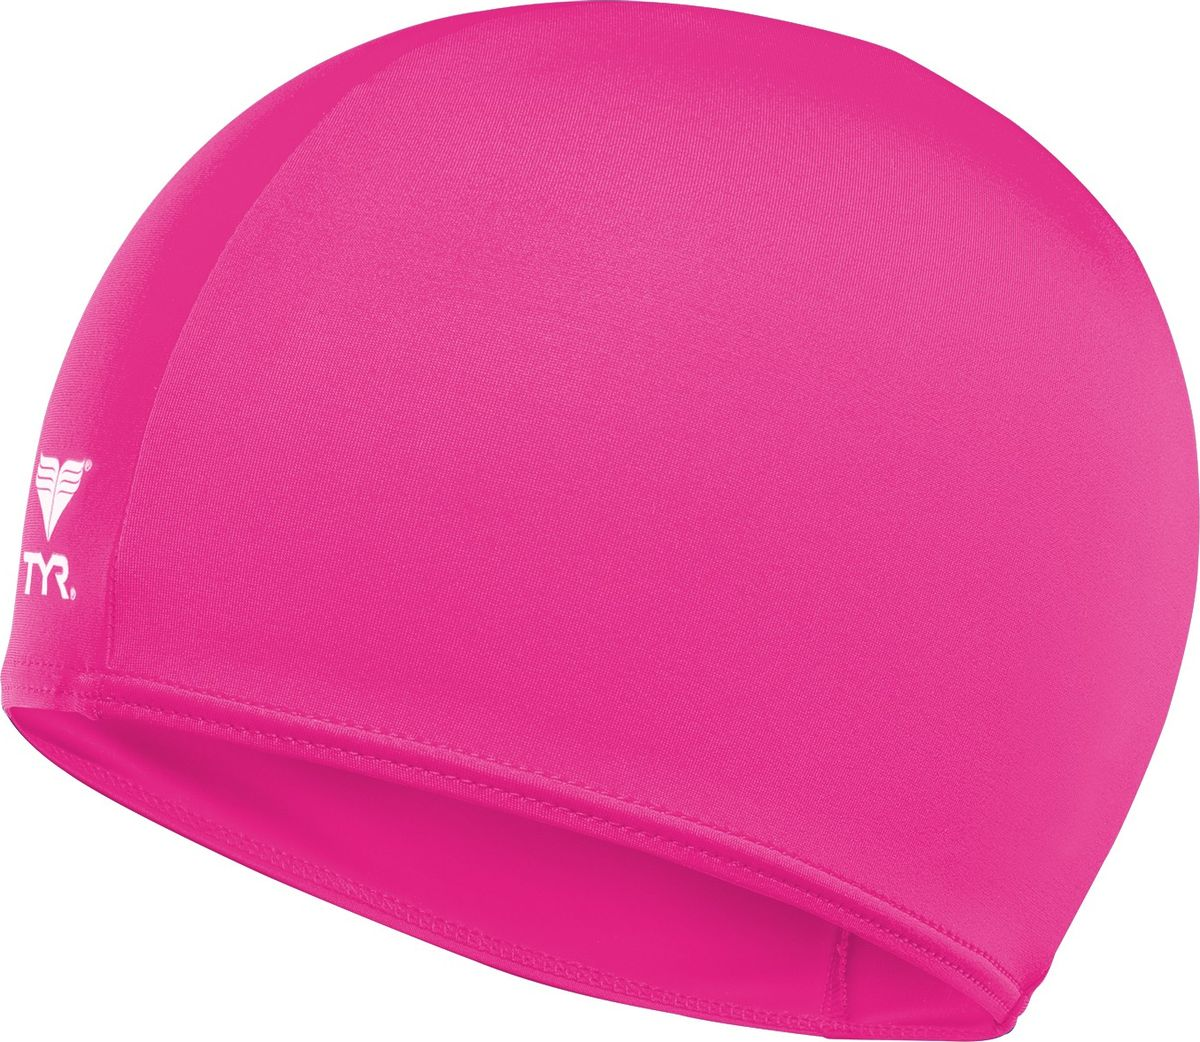 Шапочка для плавания Tyr Solid Lycra Cap, цвет: розовый. LCY tyr tyr carbon thin strap tri support bra